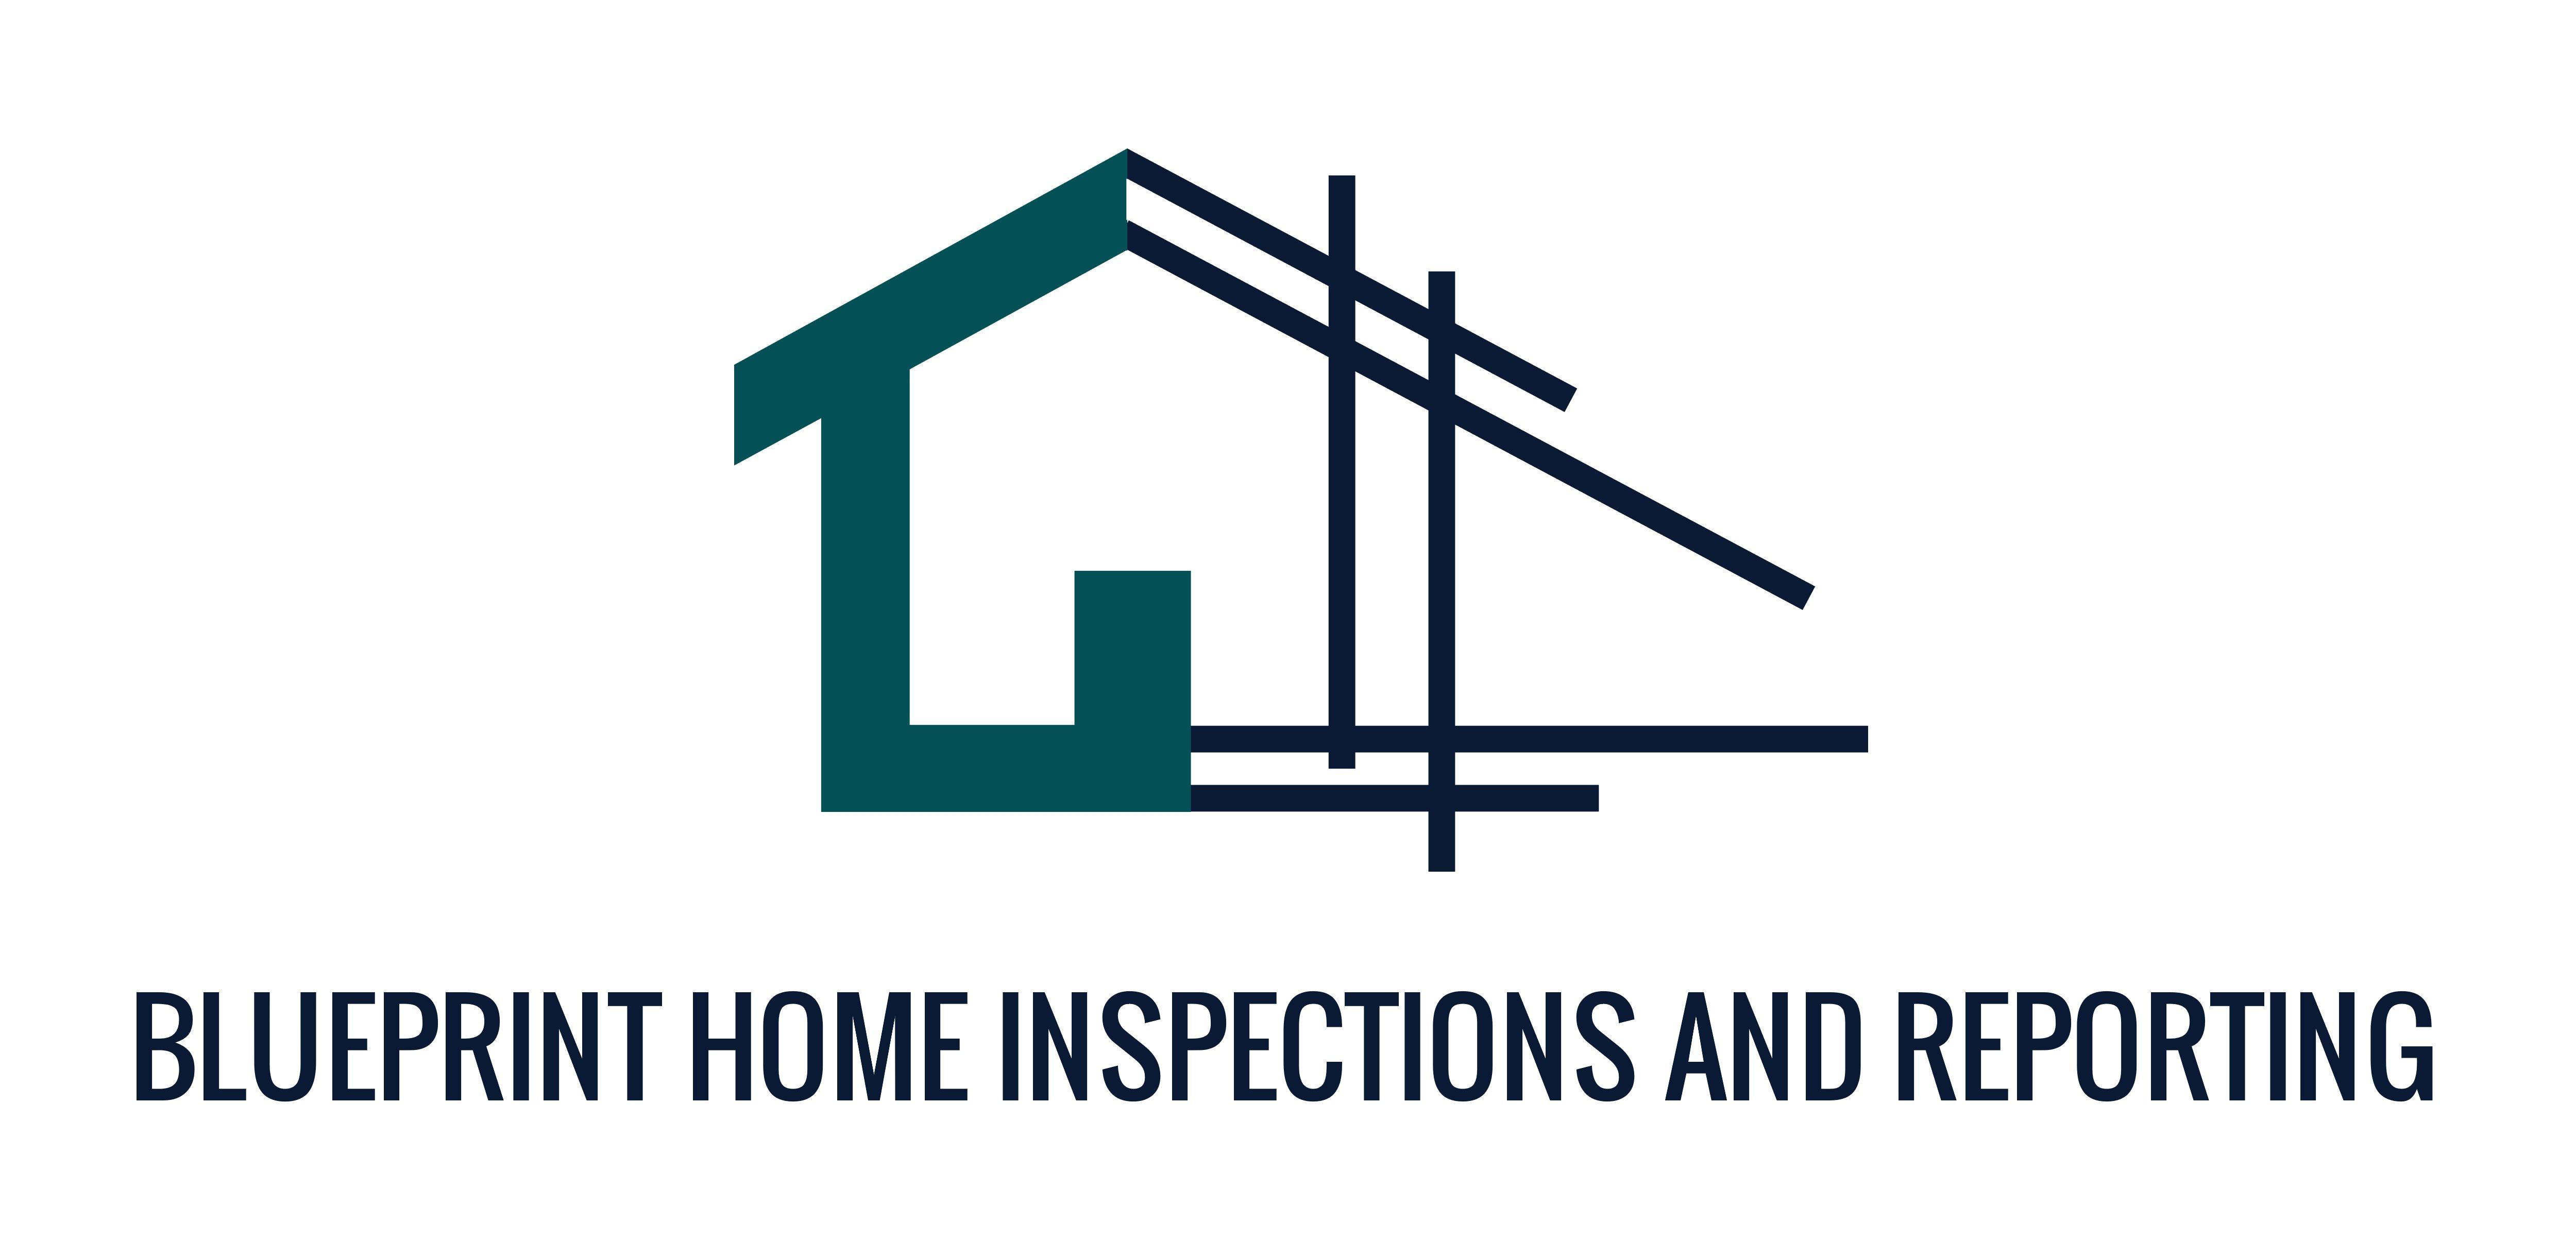 Bluprint Home Inspections